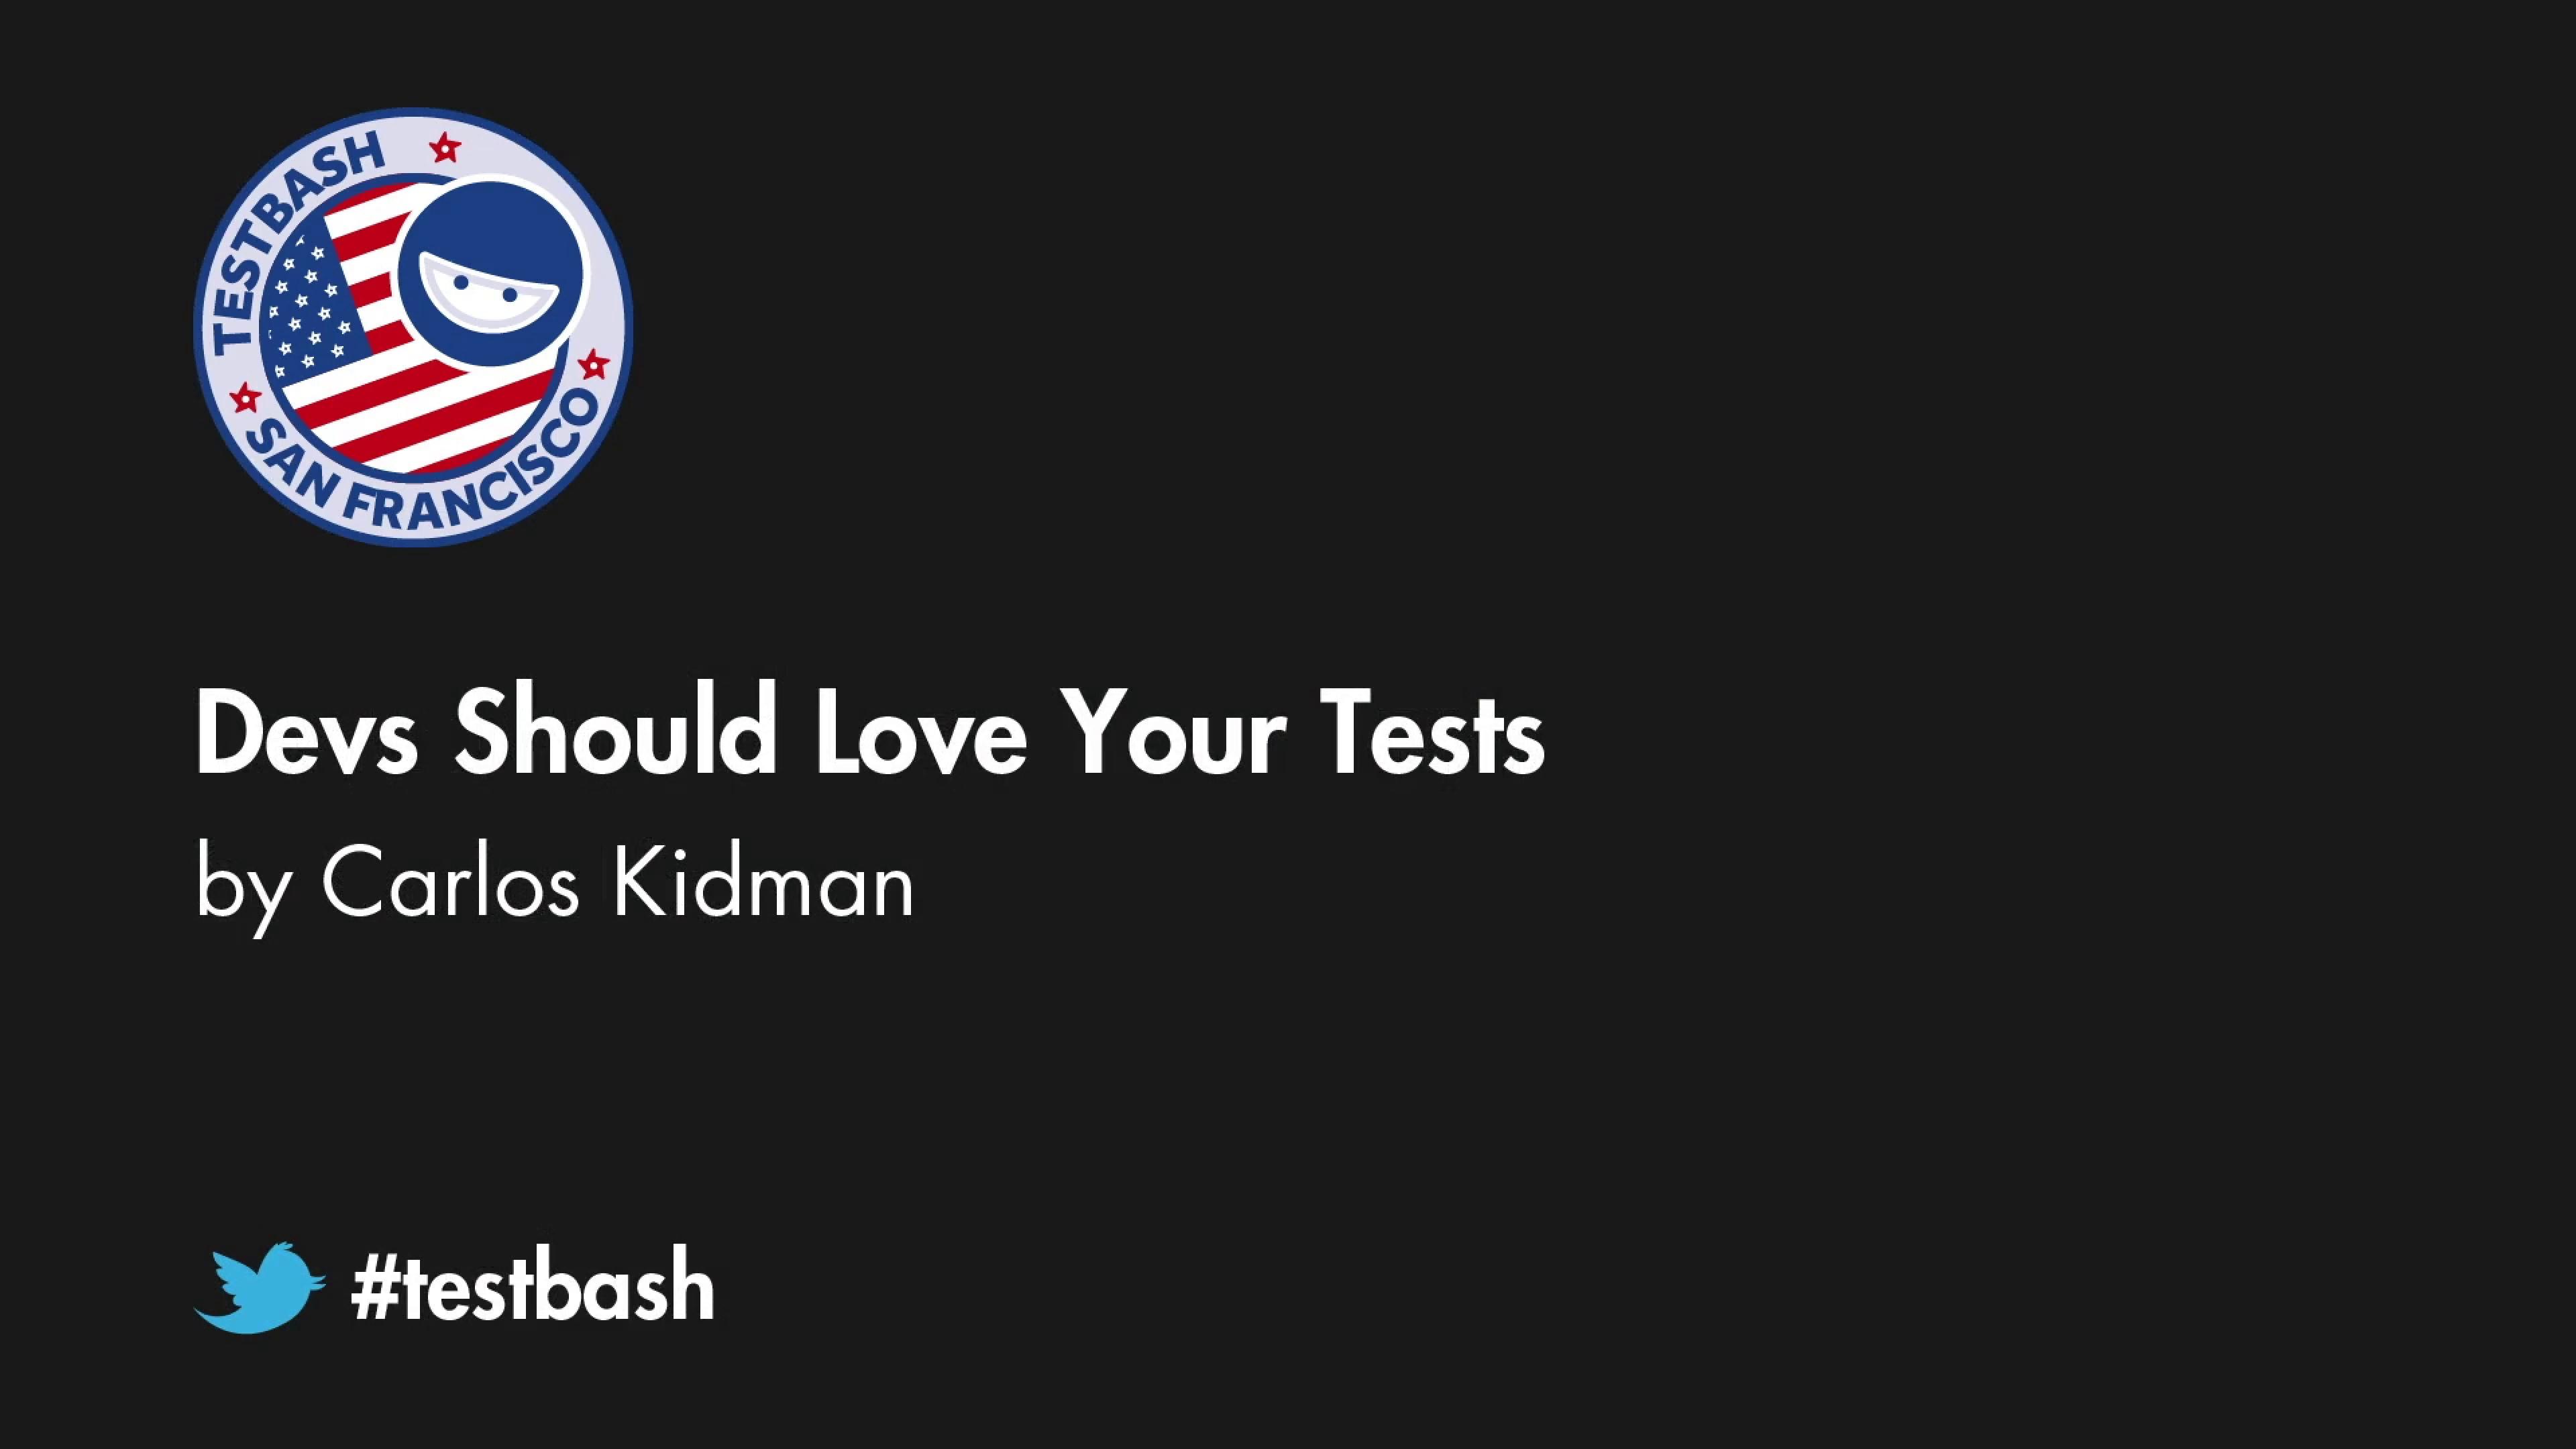 Devs Should Love Your Tests - Carlos Kidman